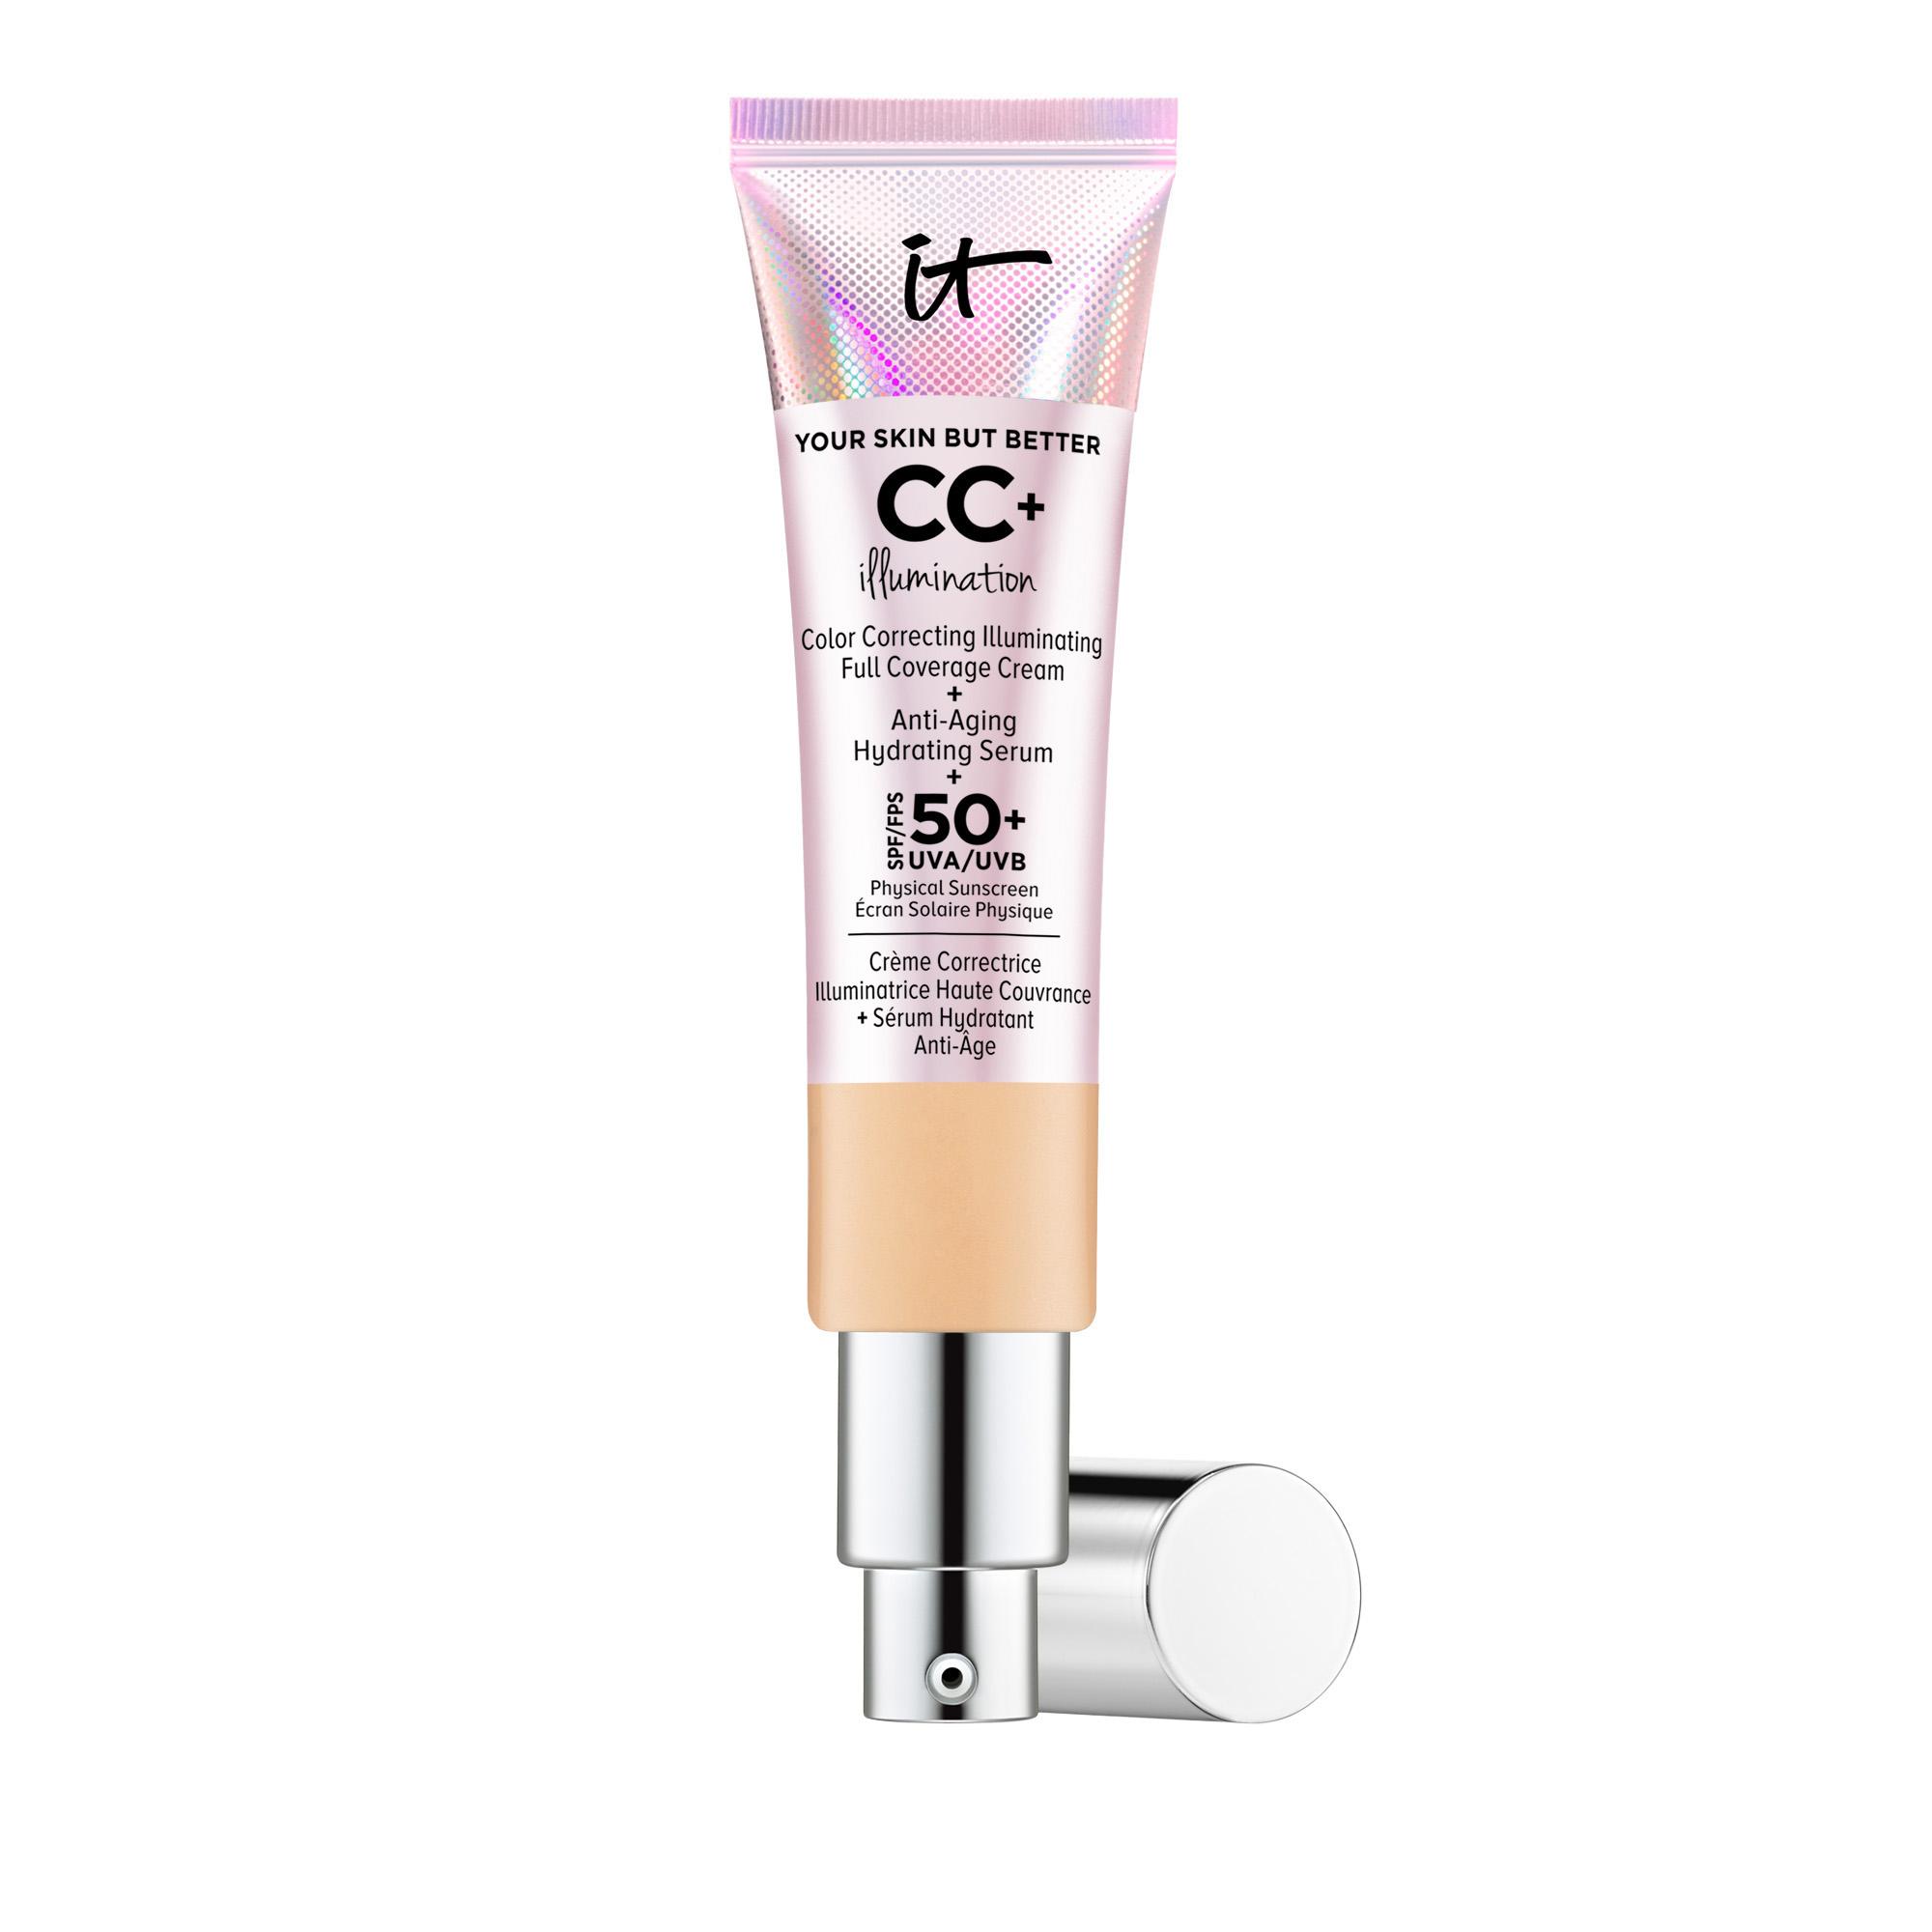 Your Skin But Better™ CC+ Illumination™ SPF 50+